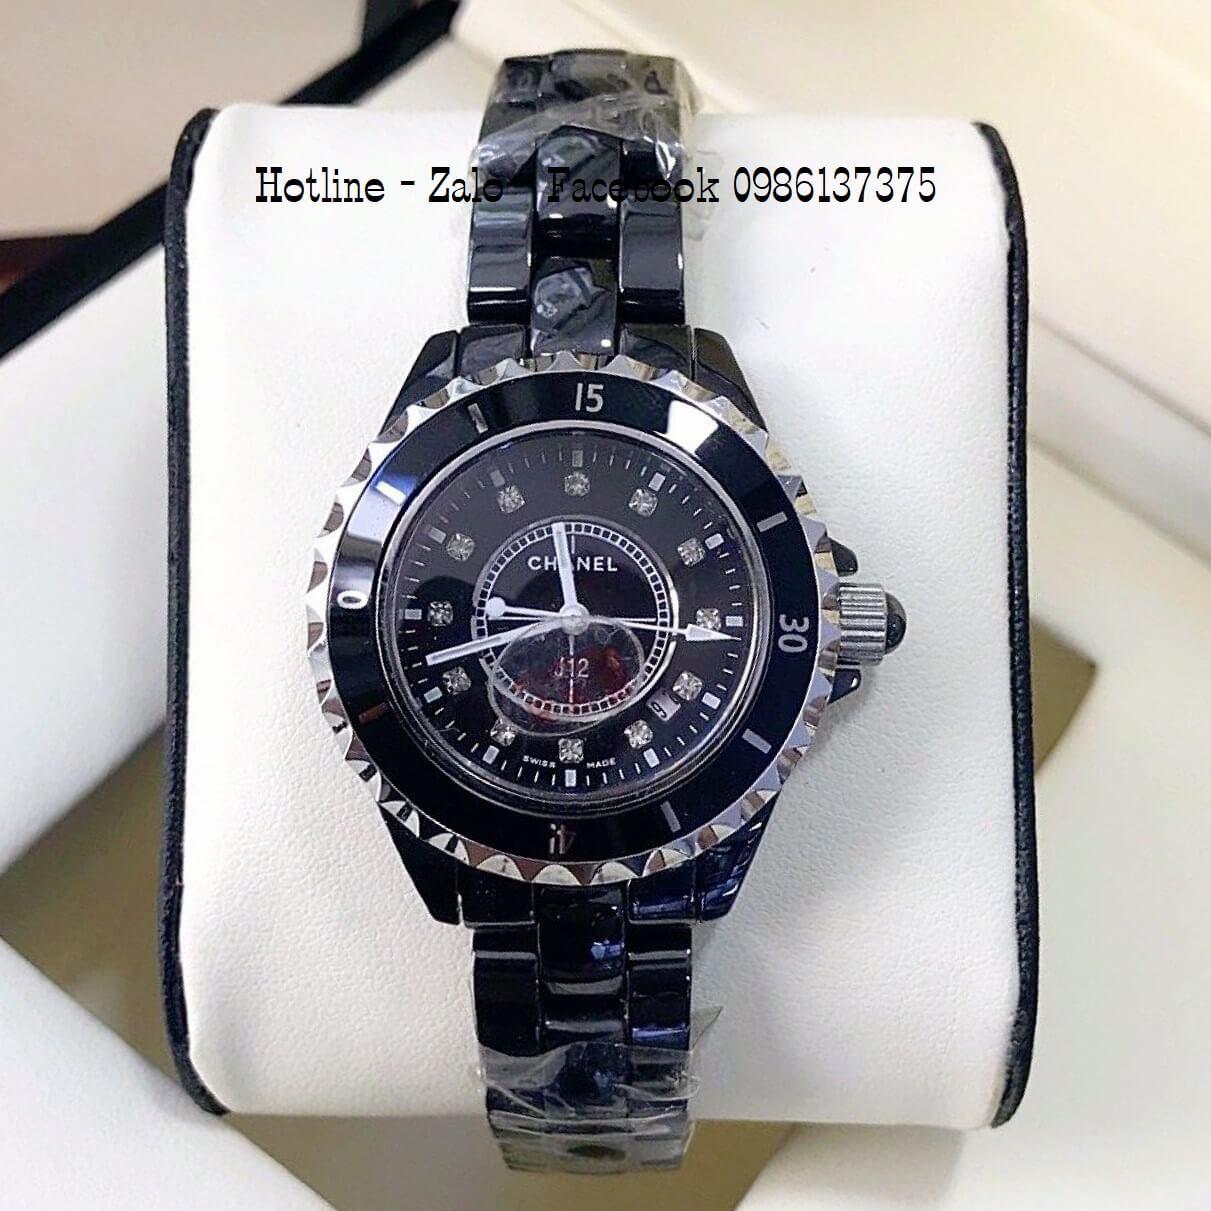 Đồng Hồ Nữ Chanel Đá Ceramic Đen 34mm - 39mm Silver